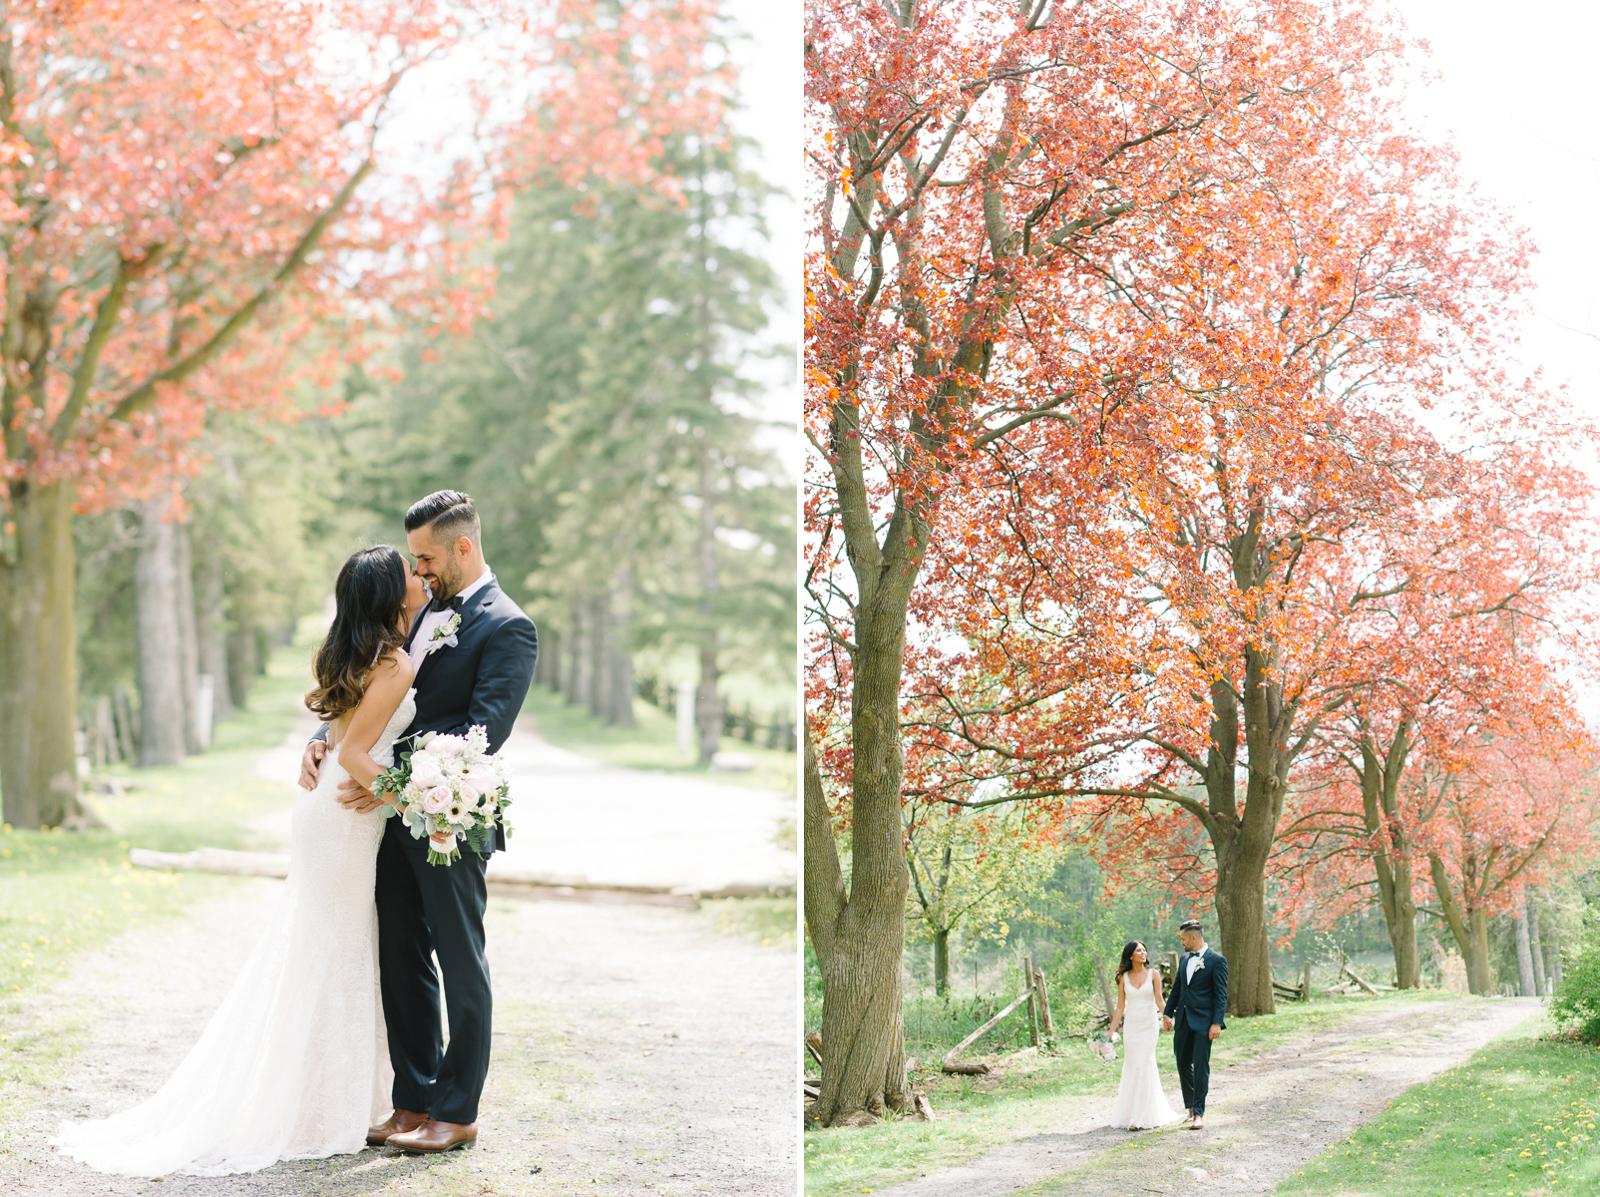 tara-mcmullen-photography-toronto-wedding-photography-alderlea-mansion-wedding-alderlea-wedding-brampton-scotsdale-farm-wedding-reem-acra-wedding-009